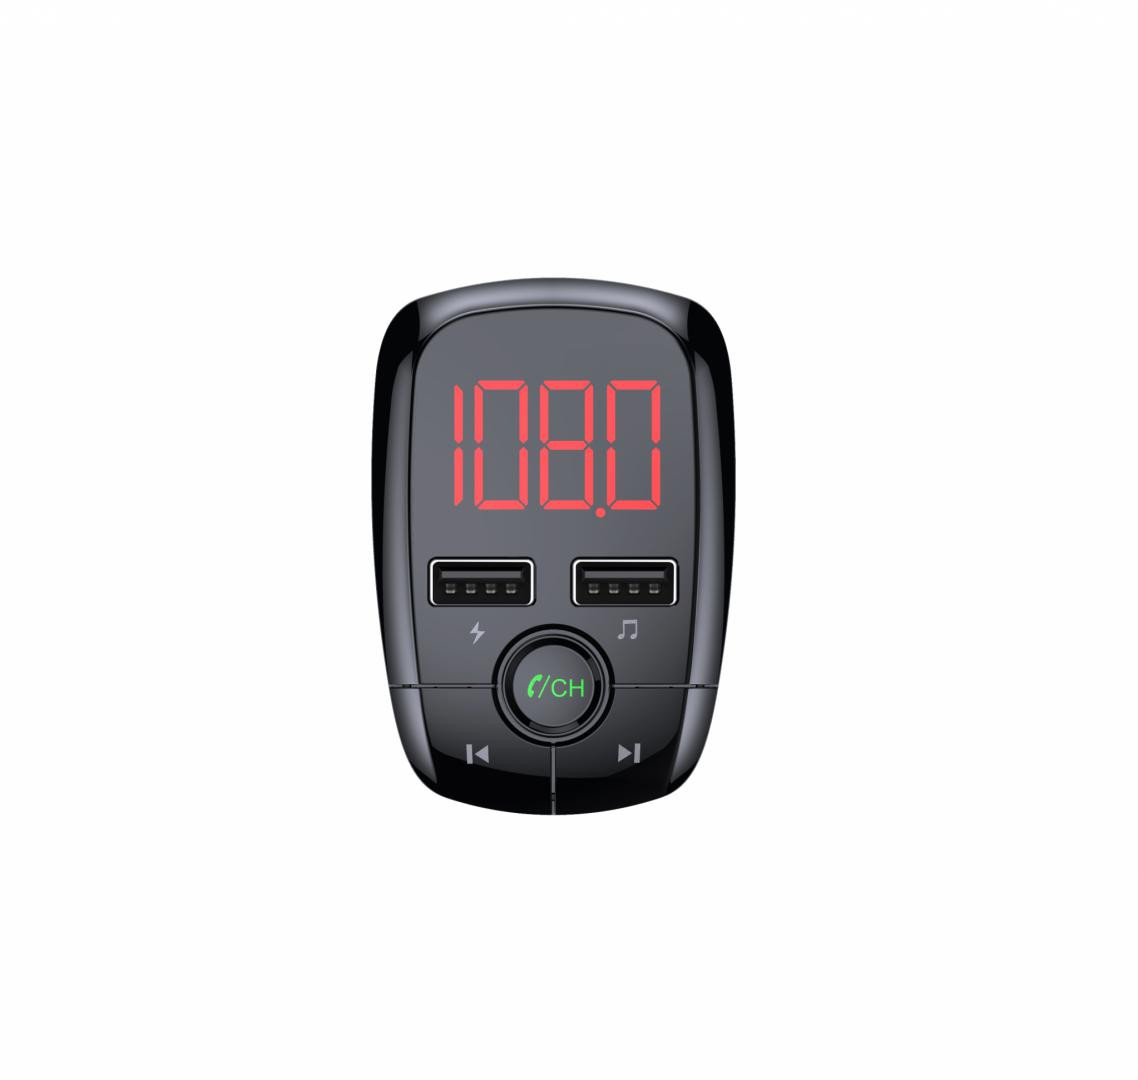 Modulator FM Serioux ABFM50, Bluetooth 5.0 , raza actiune de până la 5 m, voltaj intrare: 1x DC 12V/24V ,2 porturi USB: 1x USB DC5V 2.4A Max 1 x USB audio (pana la 32 GB), slot MicroSD (pana la 32 GB), format muzica: MP3/WMA/WAV, frecvența FM: 87.5MHz - 108.0MHZ, microfon incorporat , functii - imaginea 6